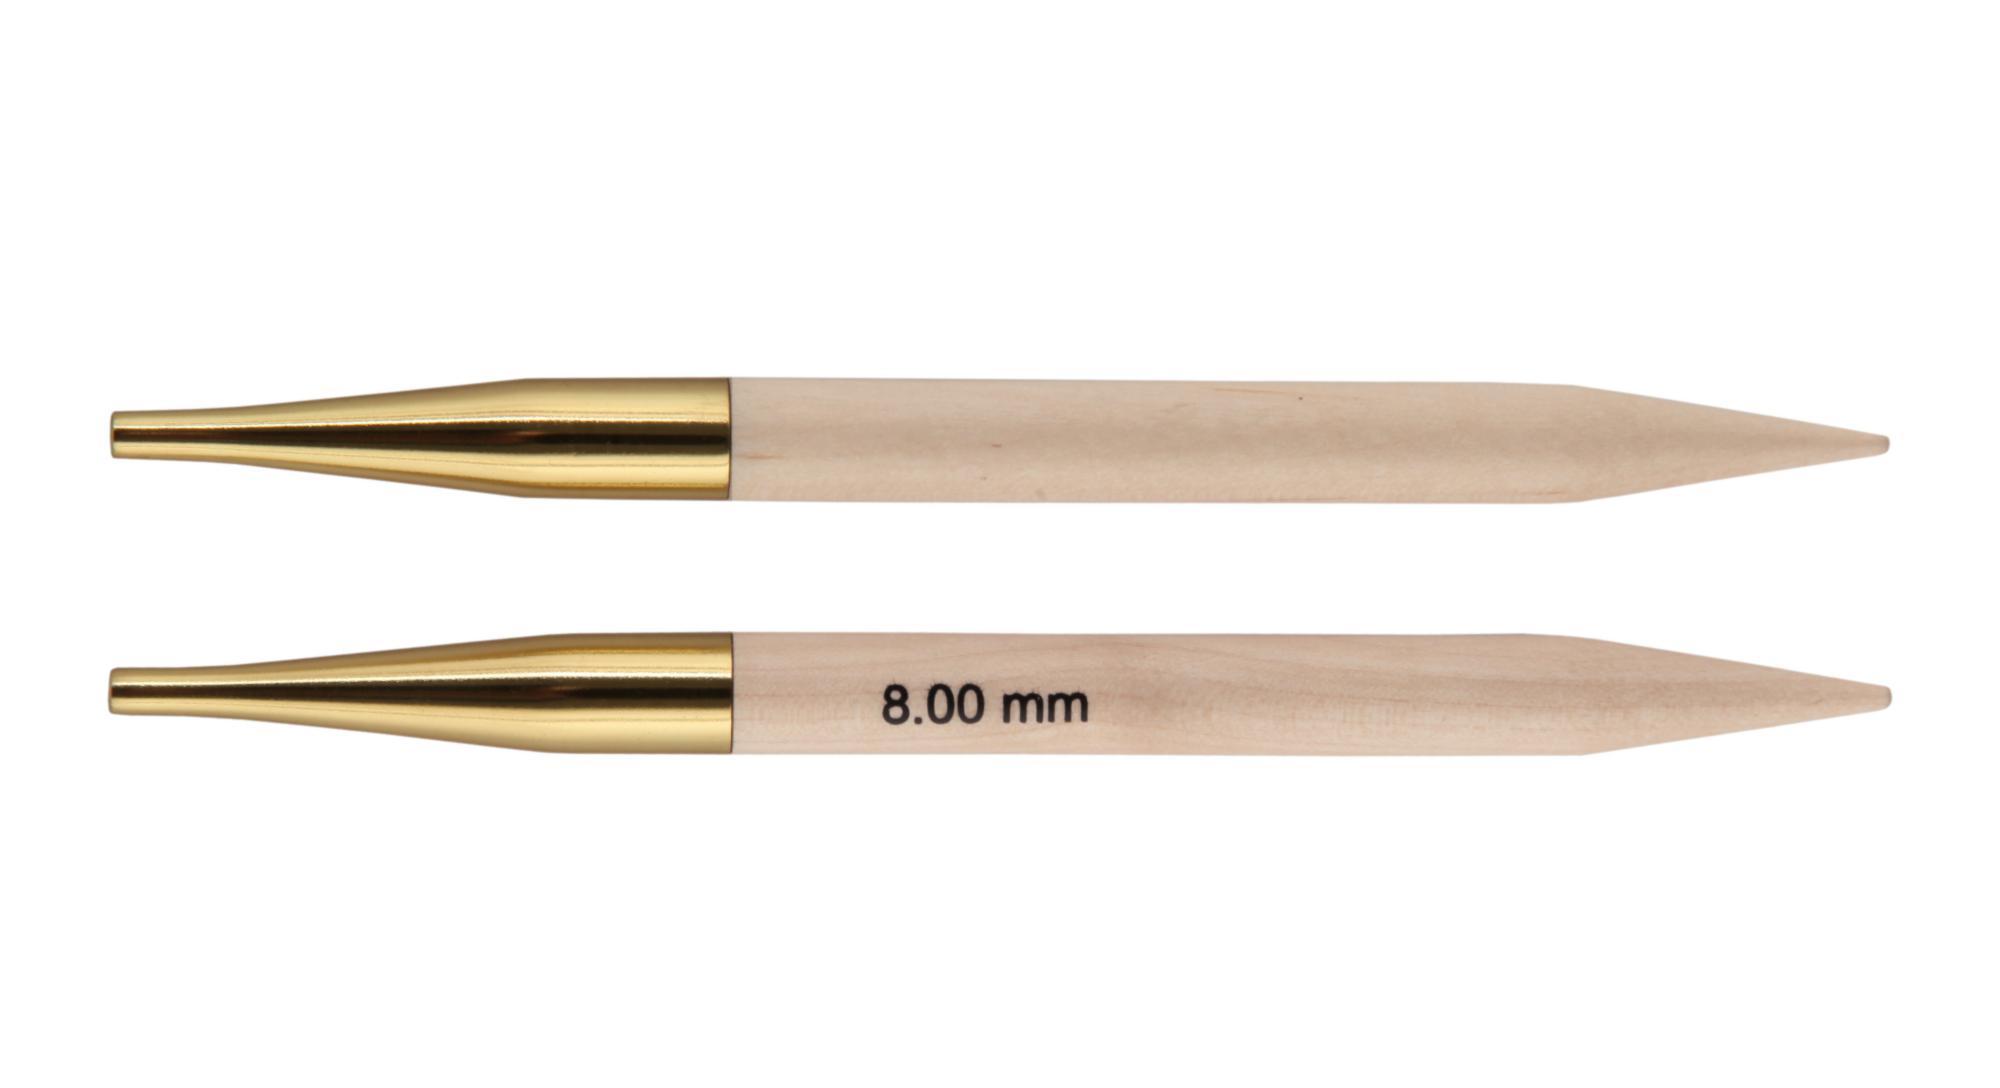 Спицы съемные Basix Birch Wood KnitPro, 35642, 8.00 мм